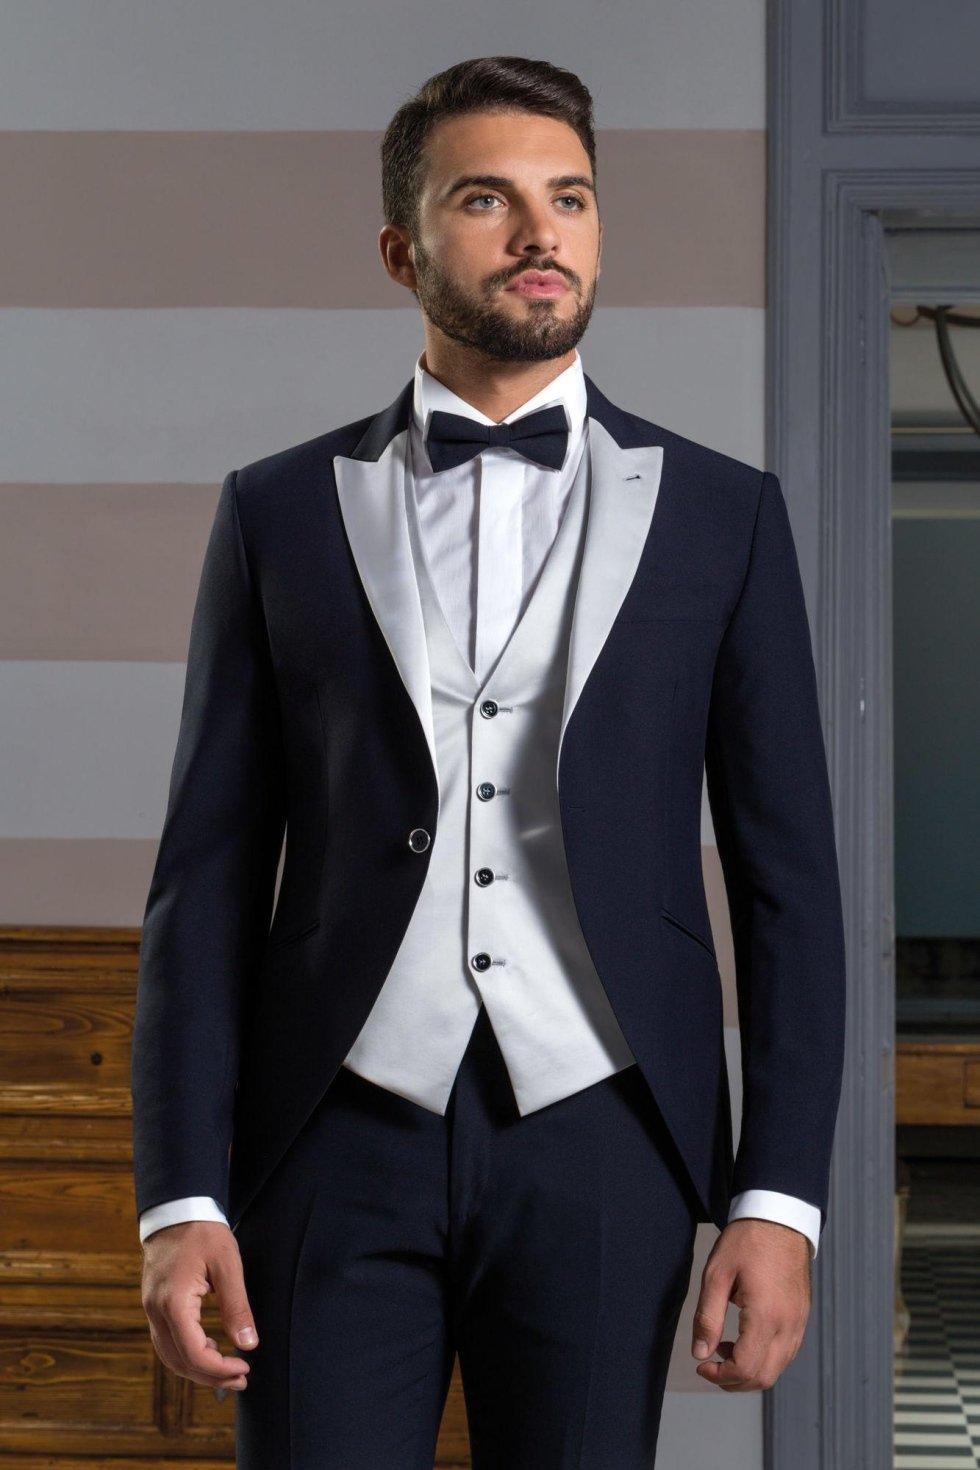 Smoking da sposo blu giacca stondata con revers e gilet grigio argento